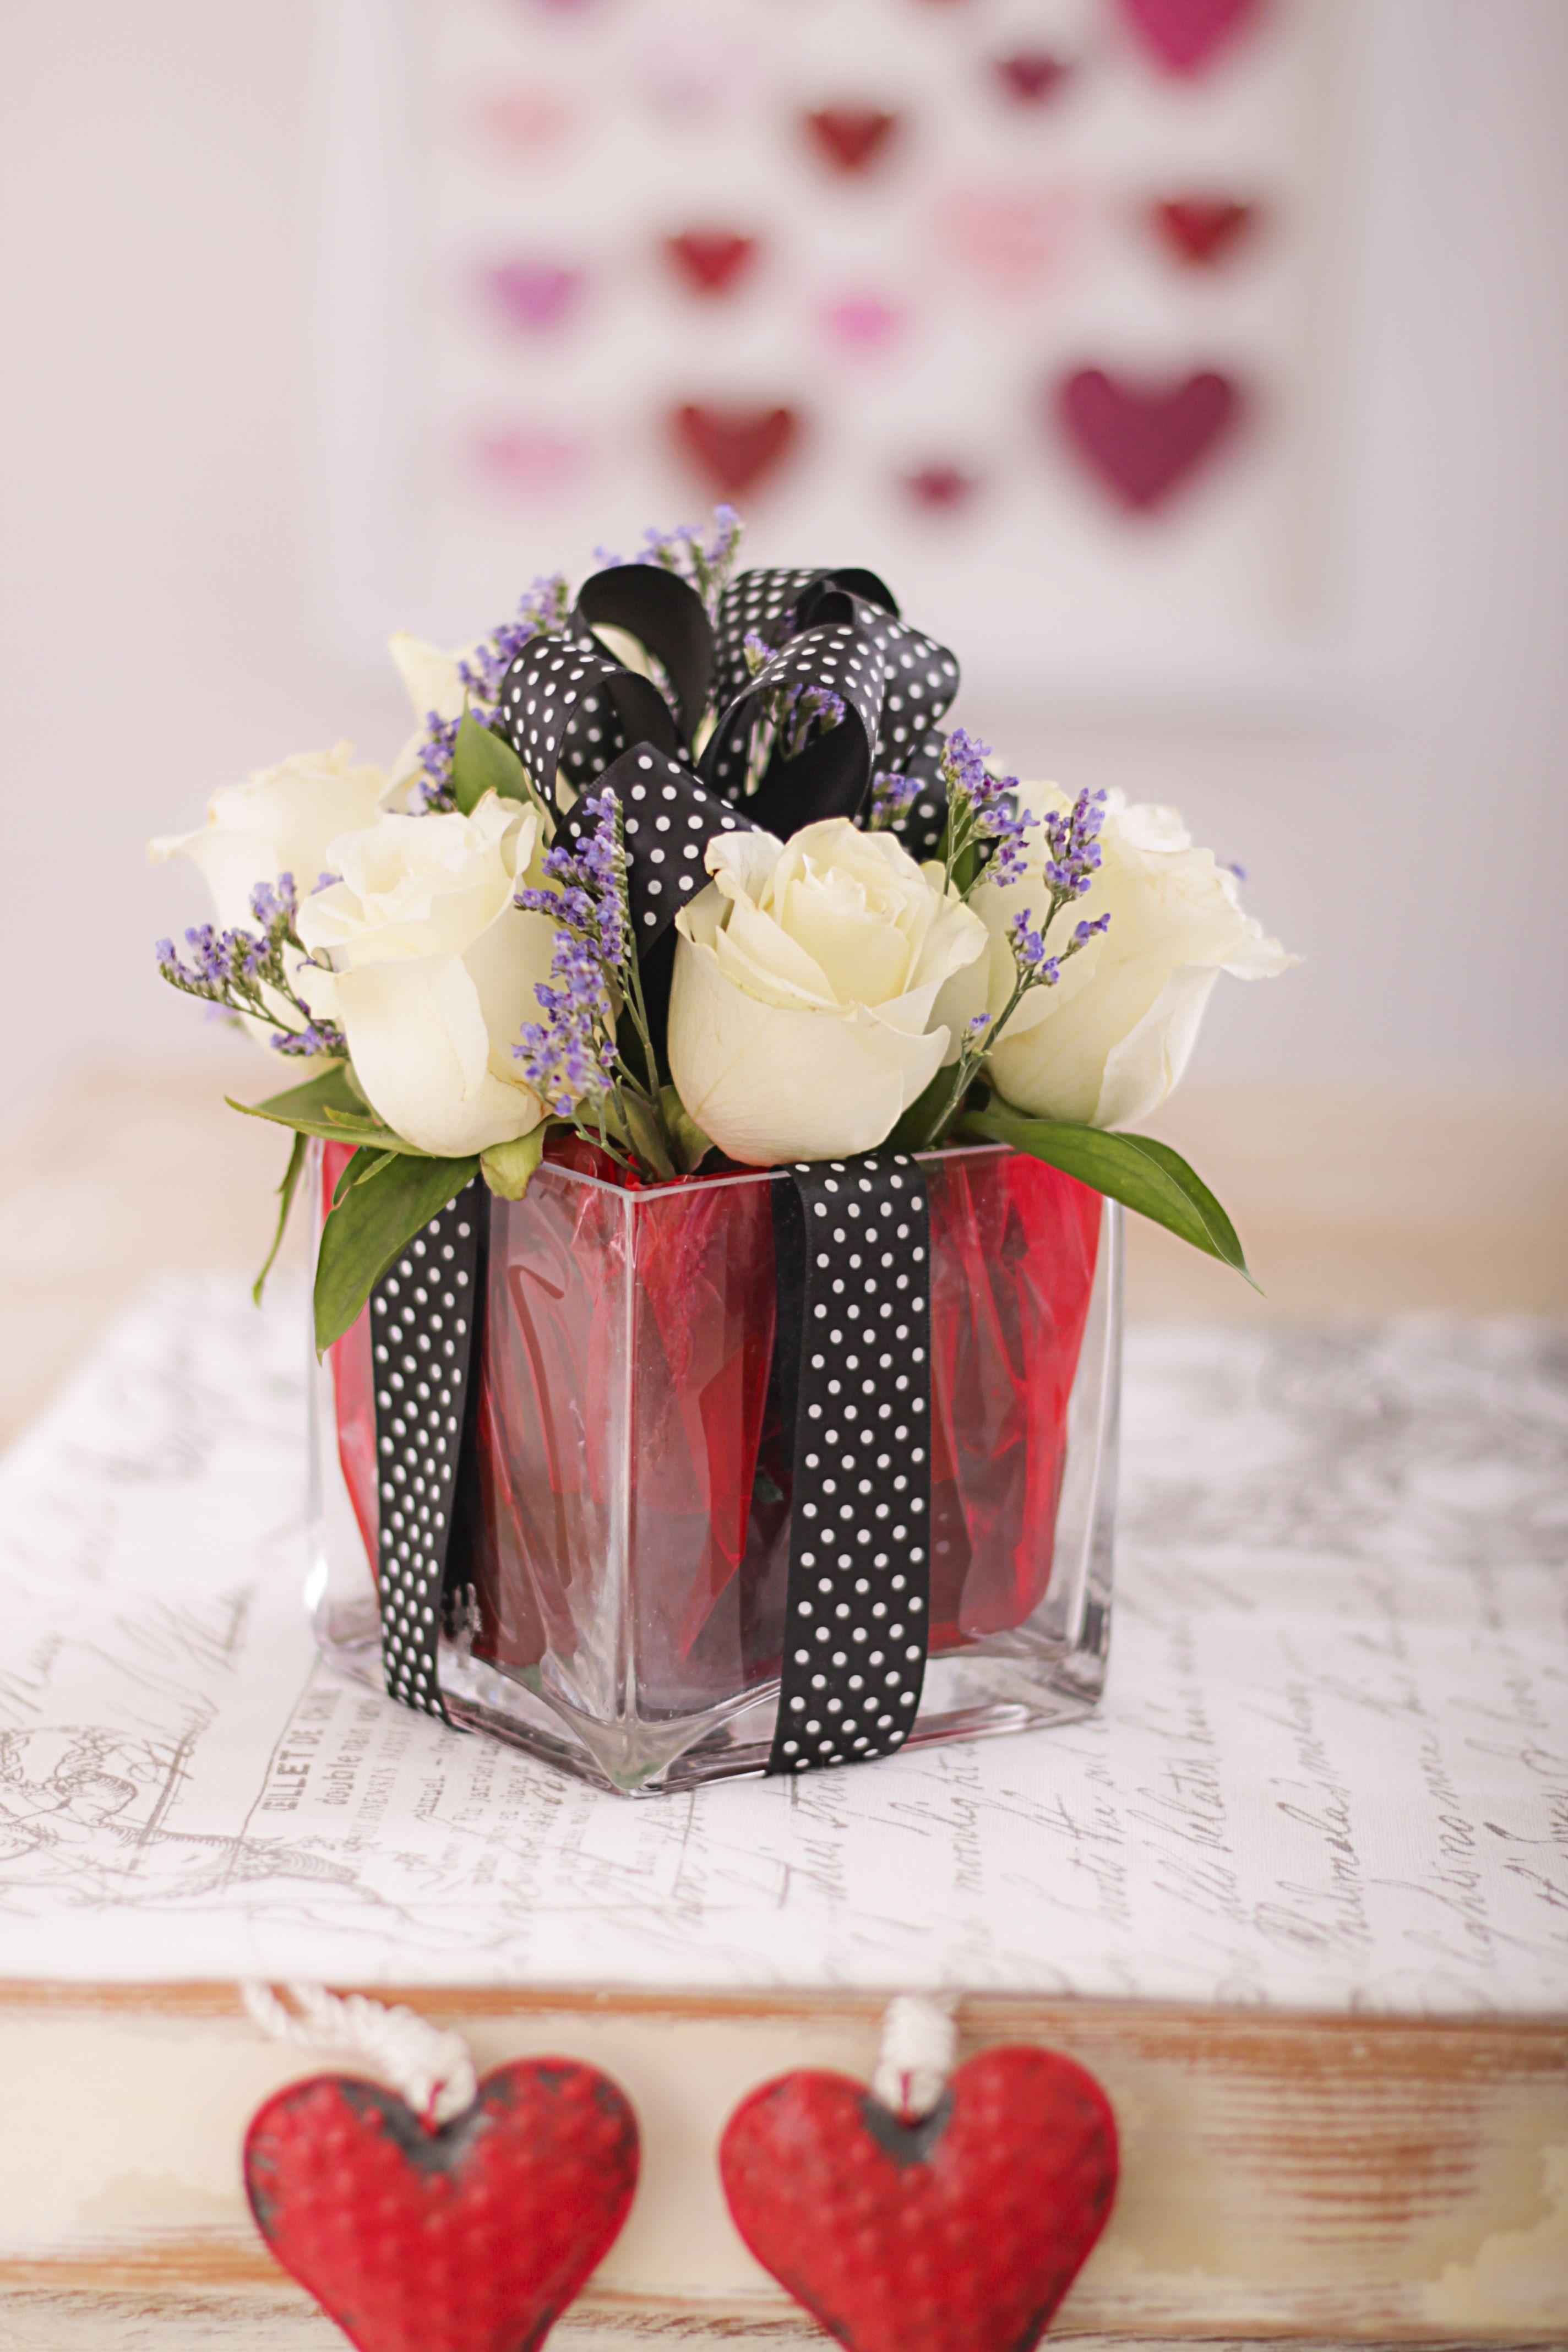 Pretty romantic flowers